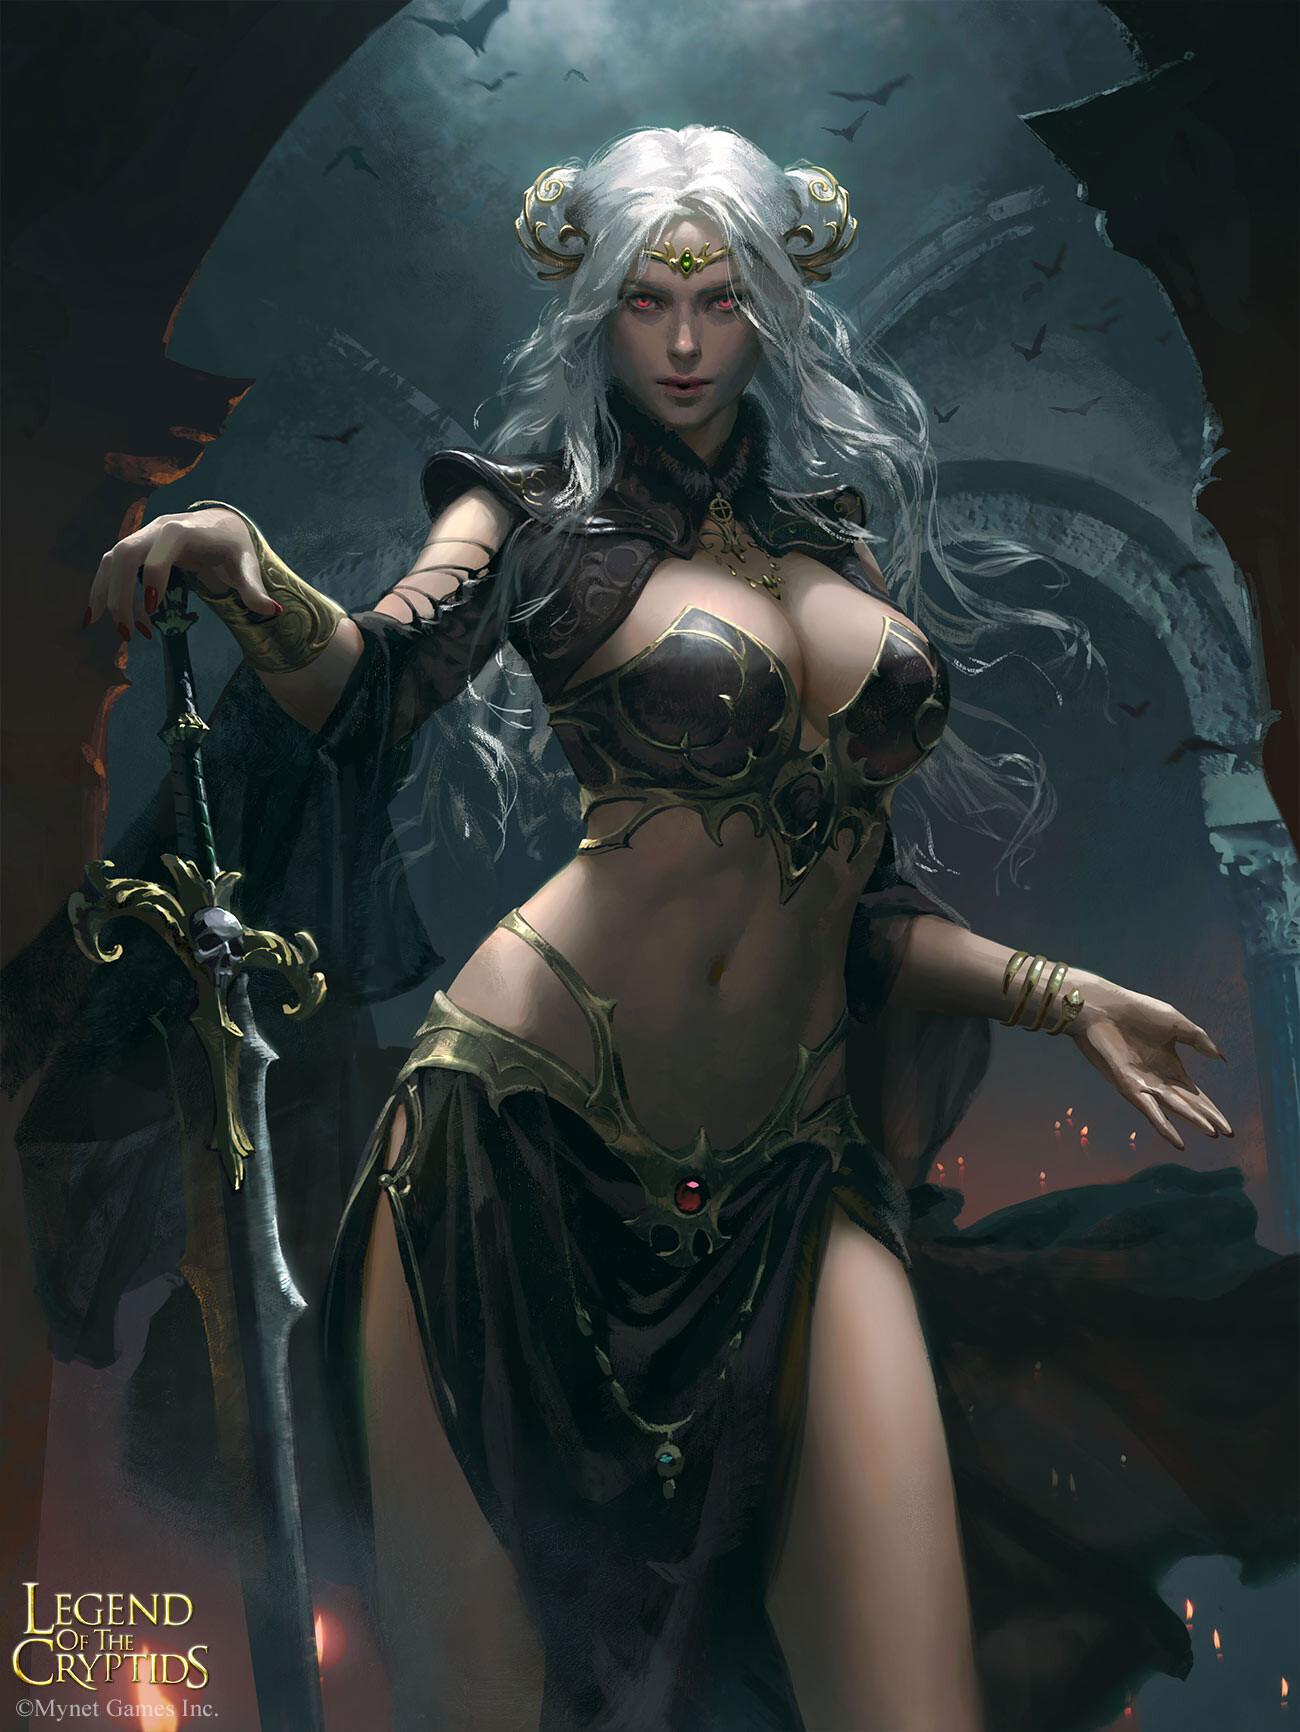 General 1300x1732 artwork fantasy girl Legend of the Cryptids white hair red eyes boobs belly women sword girls with swords fantasy art bikini armor